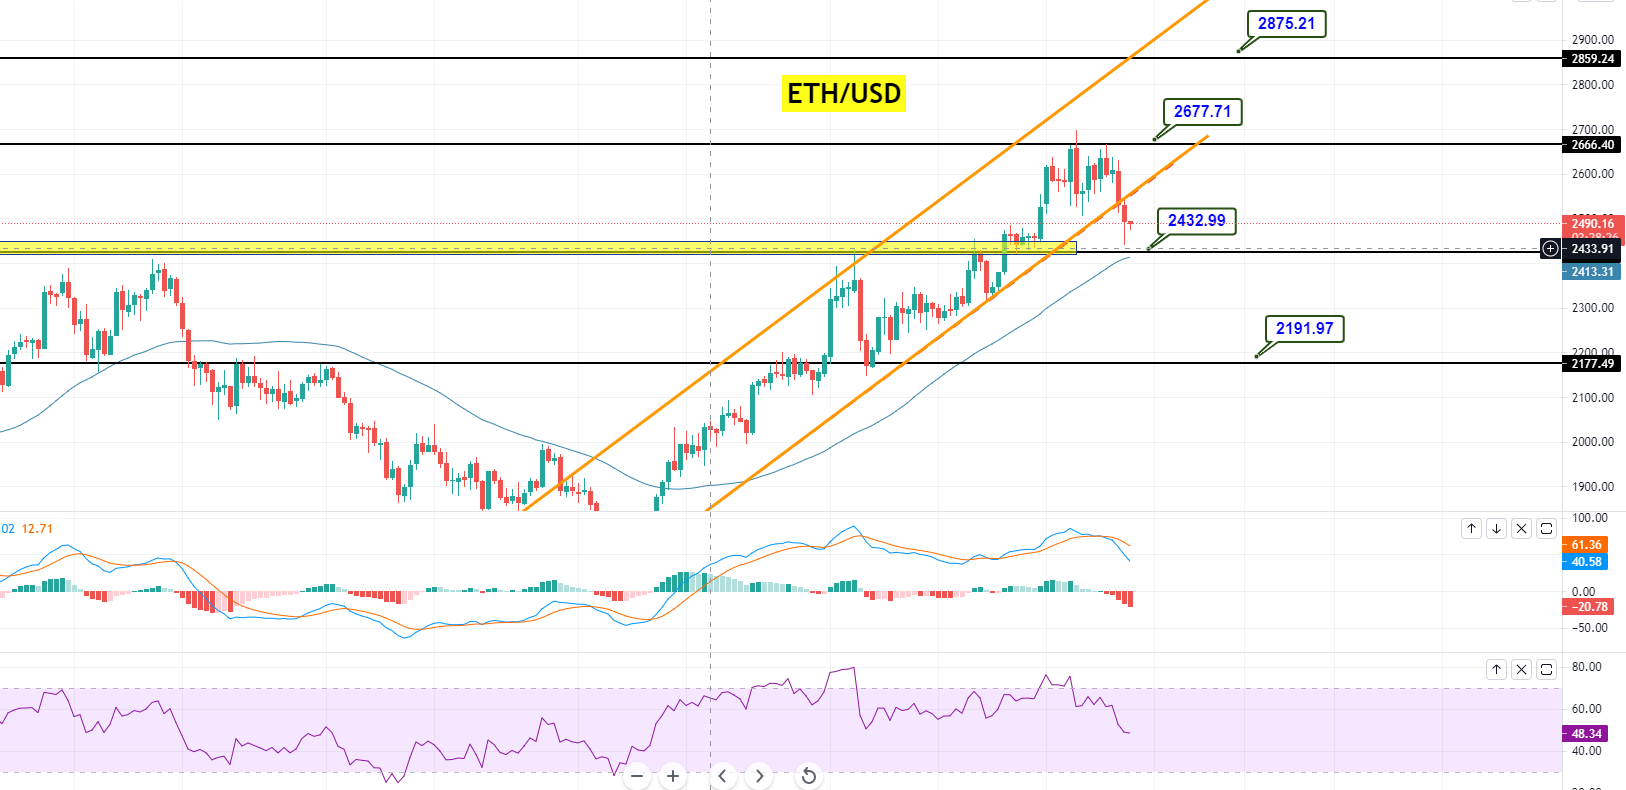 Ethereum Violates Upward Channel - Sellers Eyeing 2,400 - FX Leaders